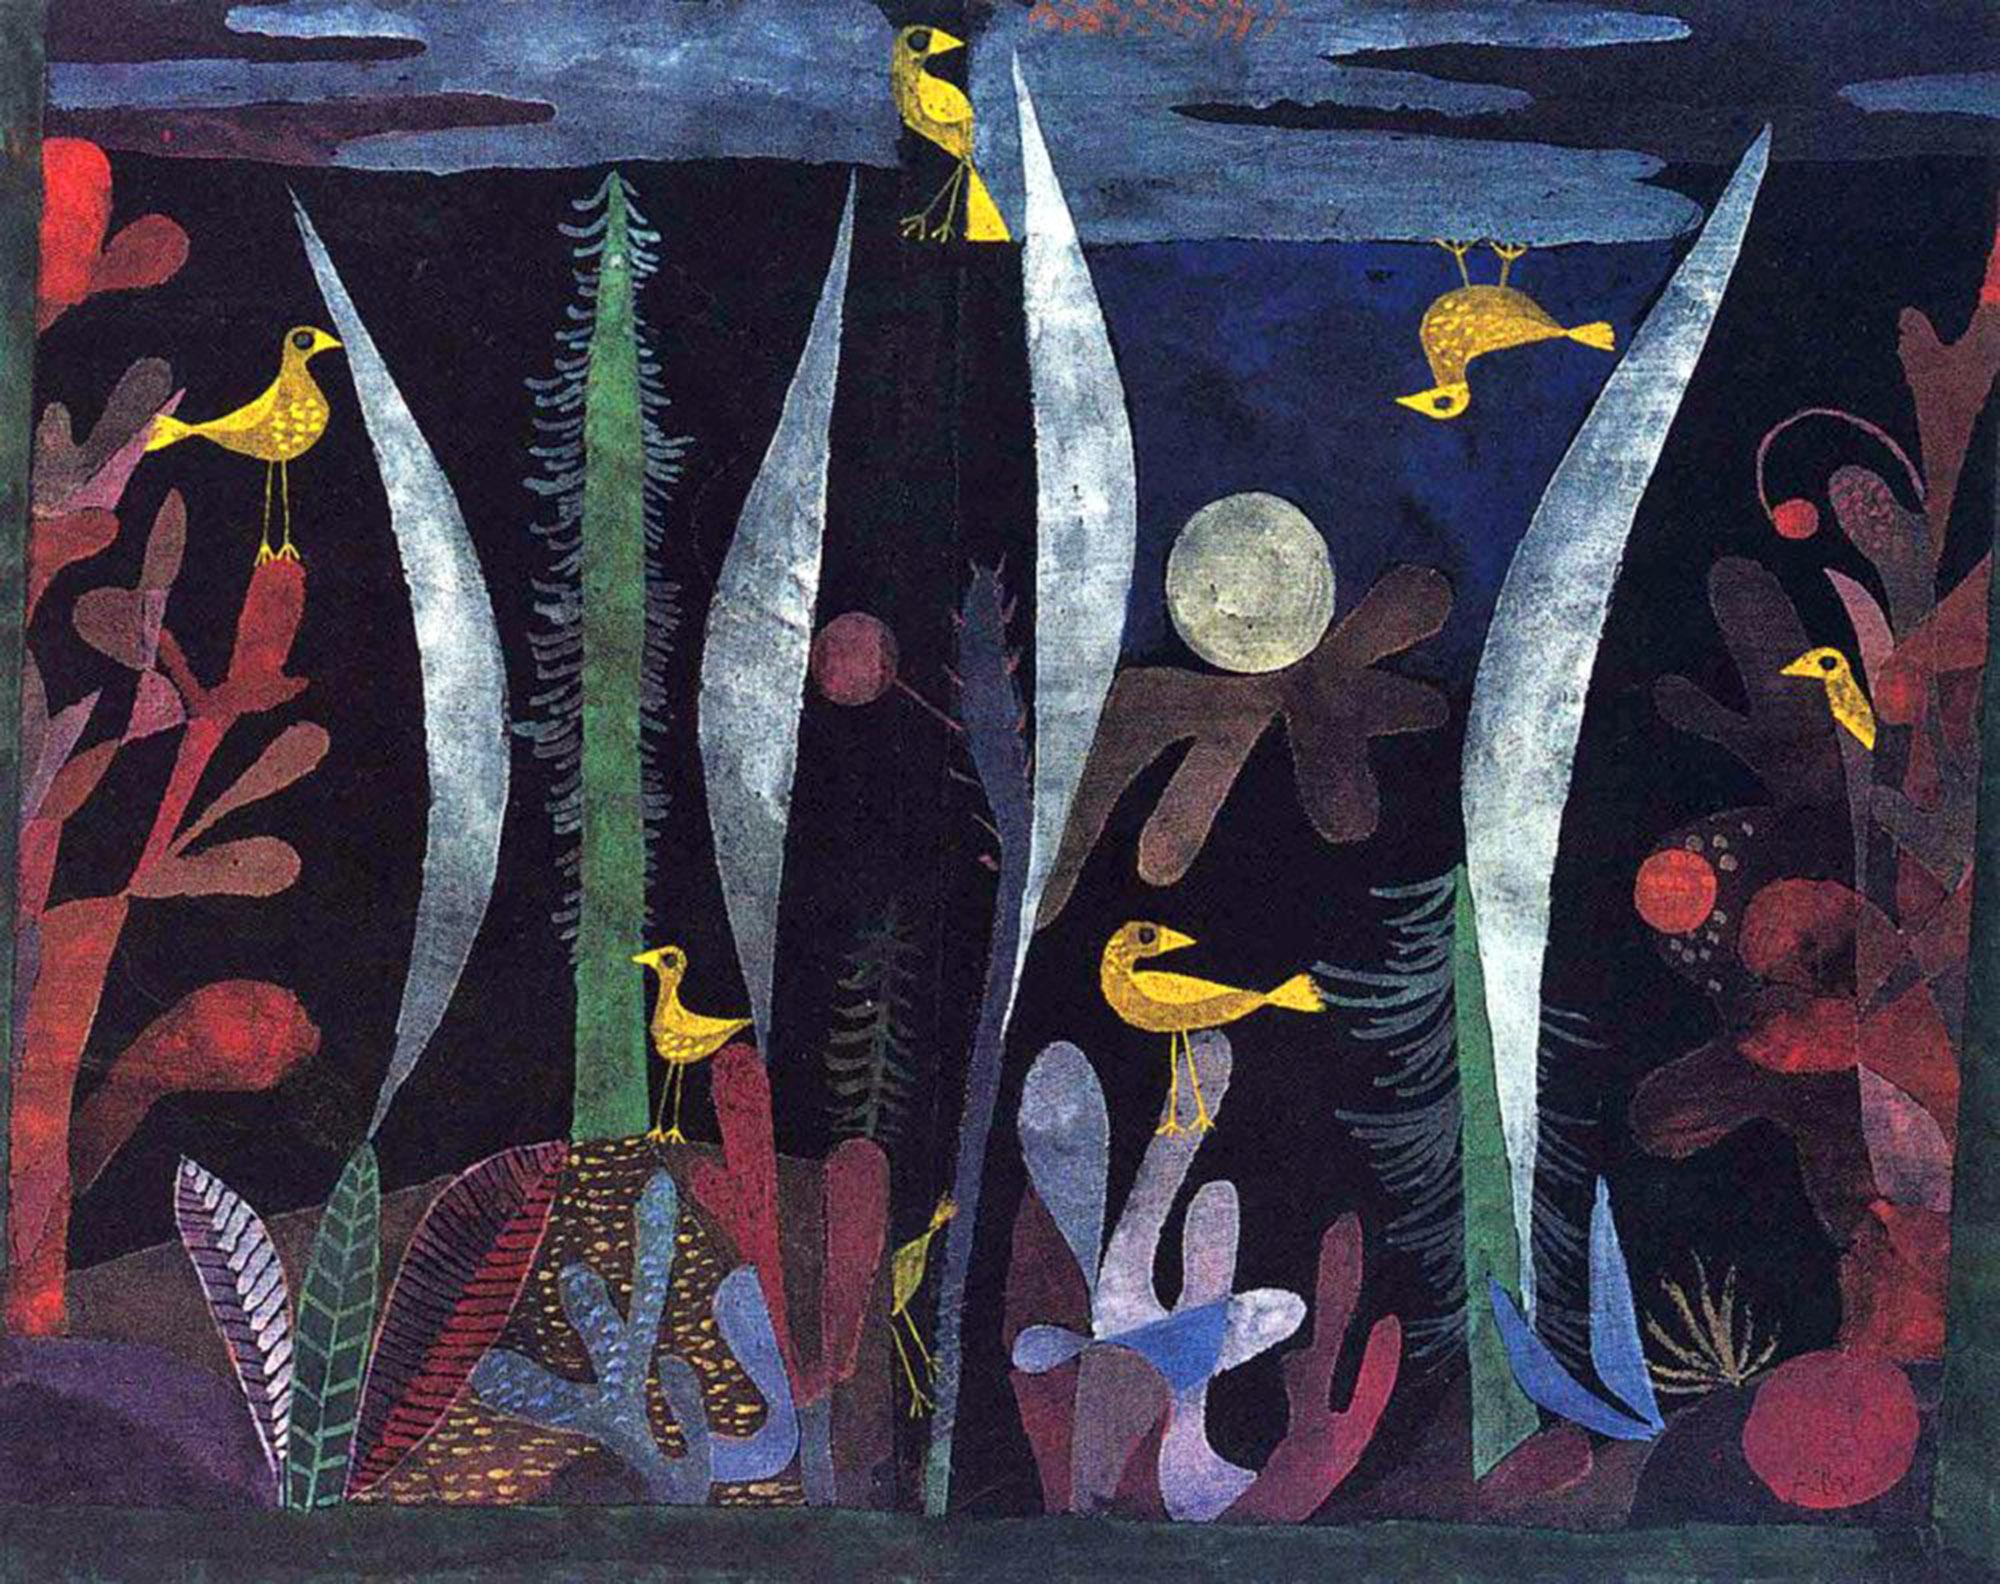 paul klee, paesaggio con uccelli gialli, 1923